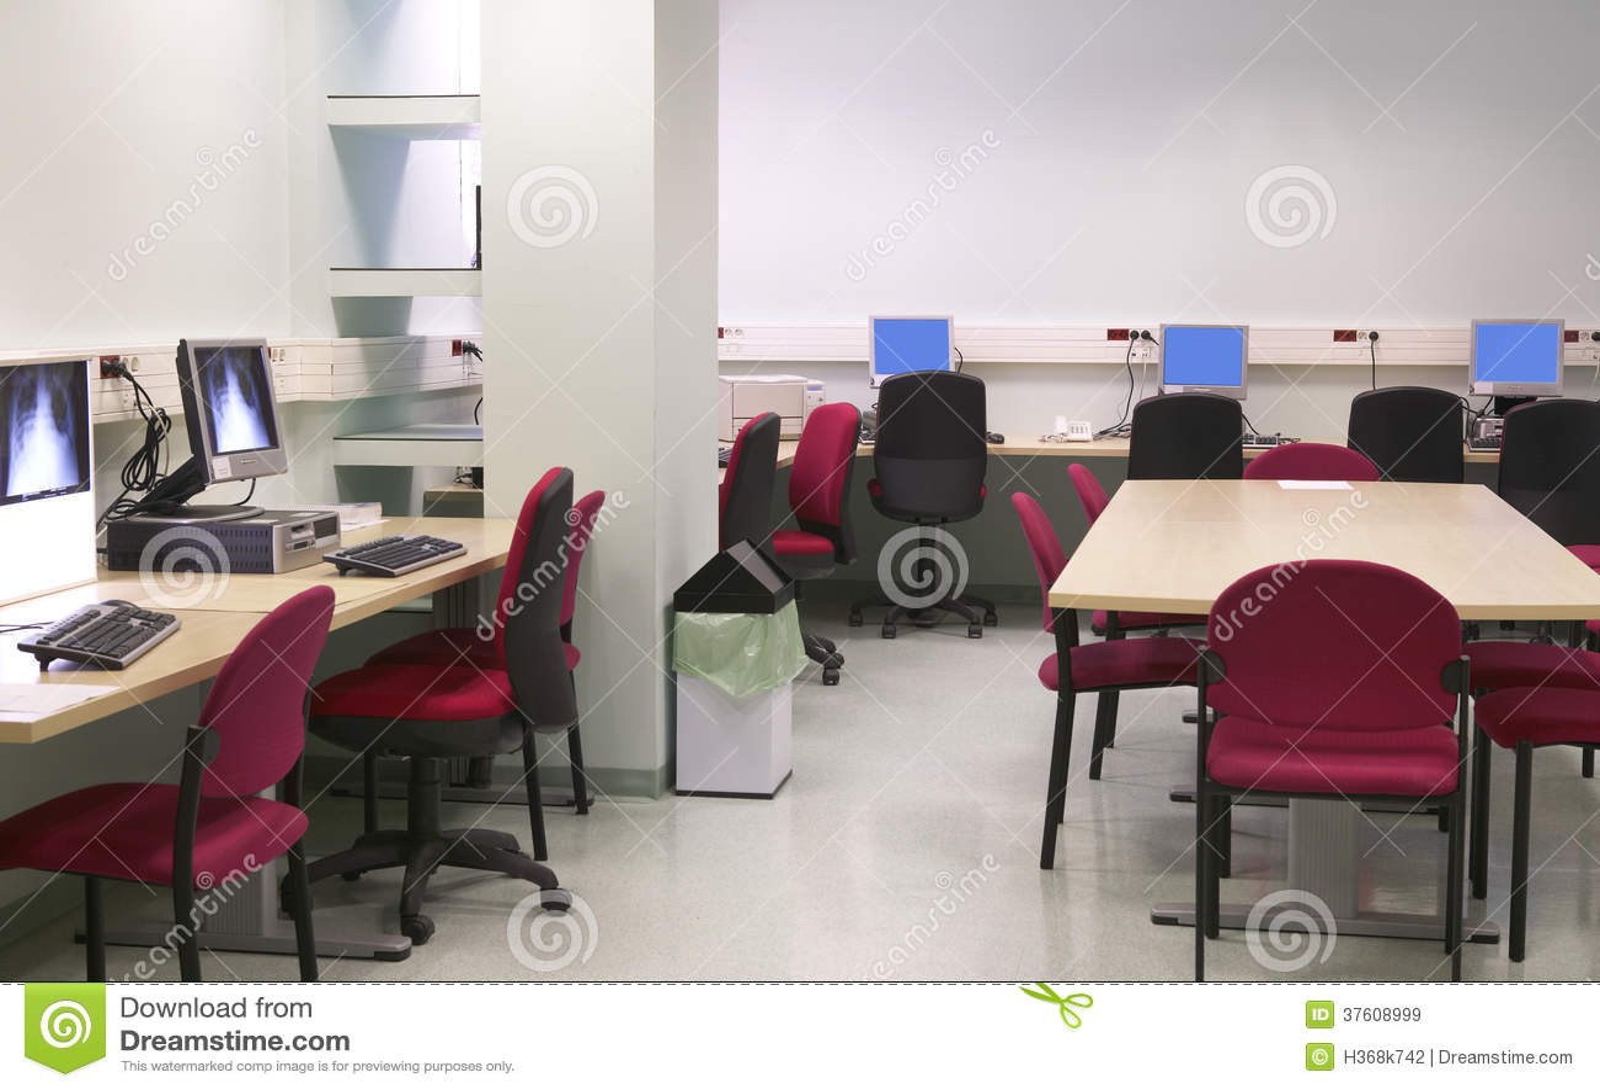 Multimedia Classroom Design : Multimedia classroom royalty free stock images image